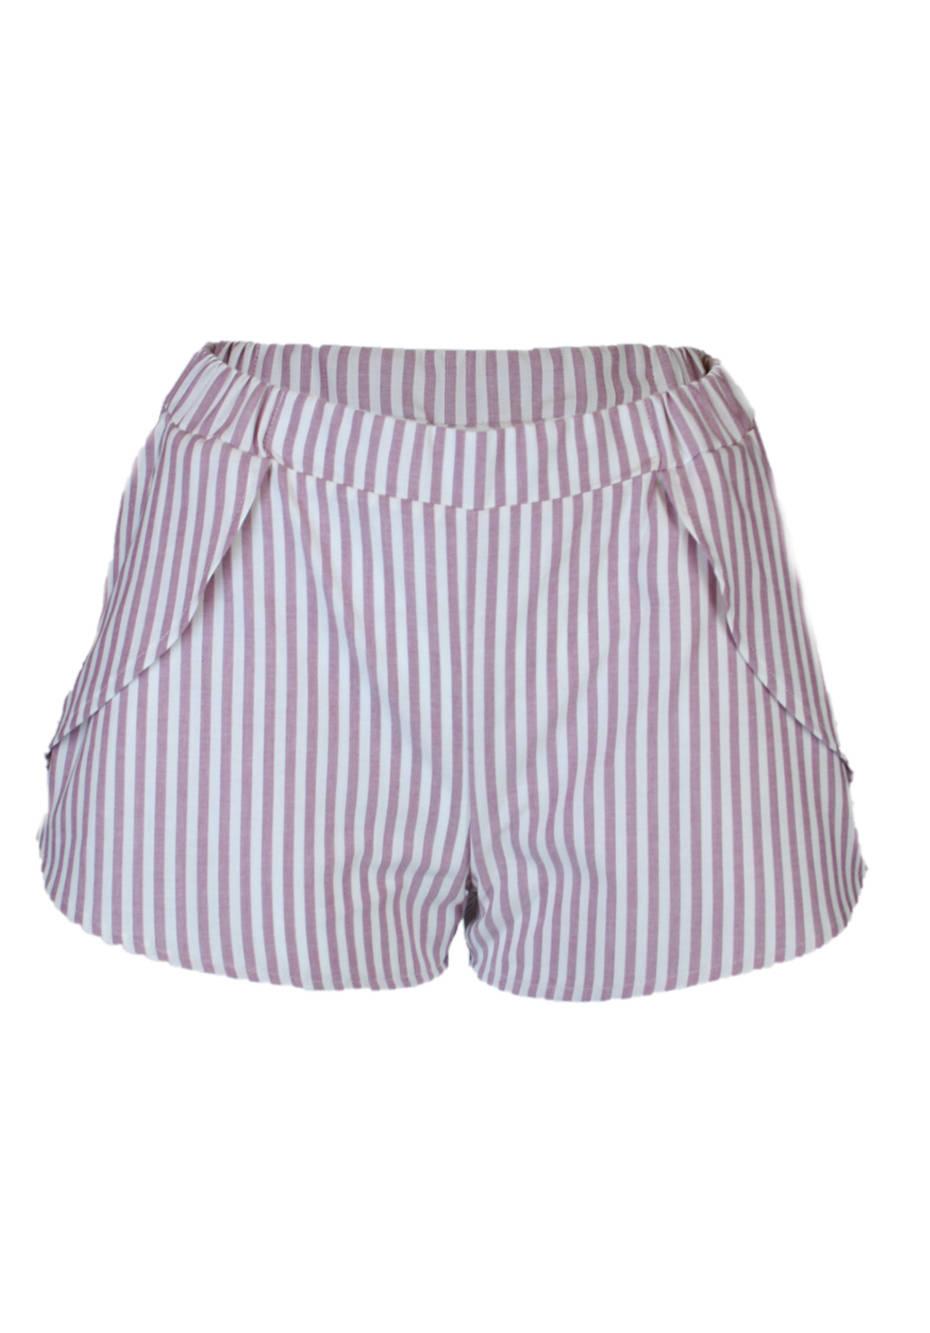 ARON shorts